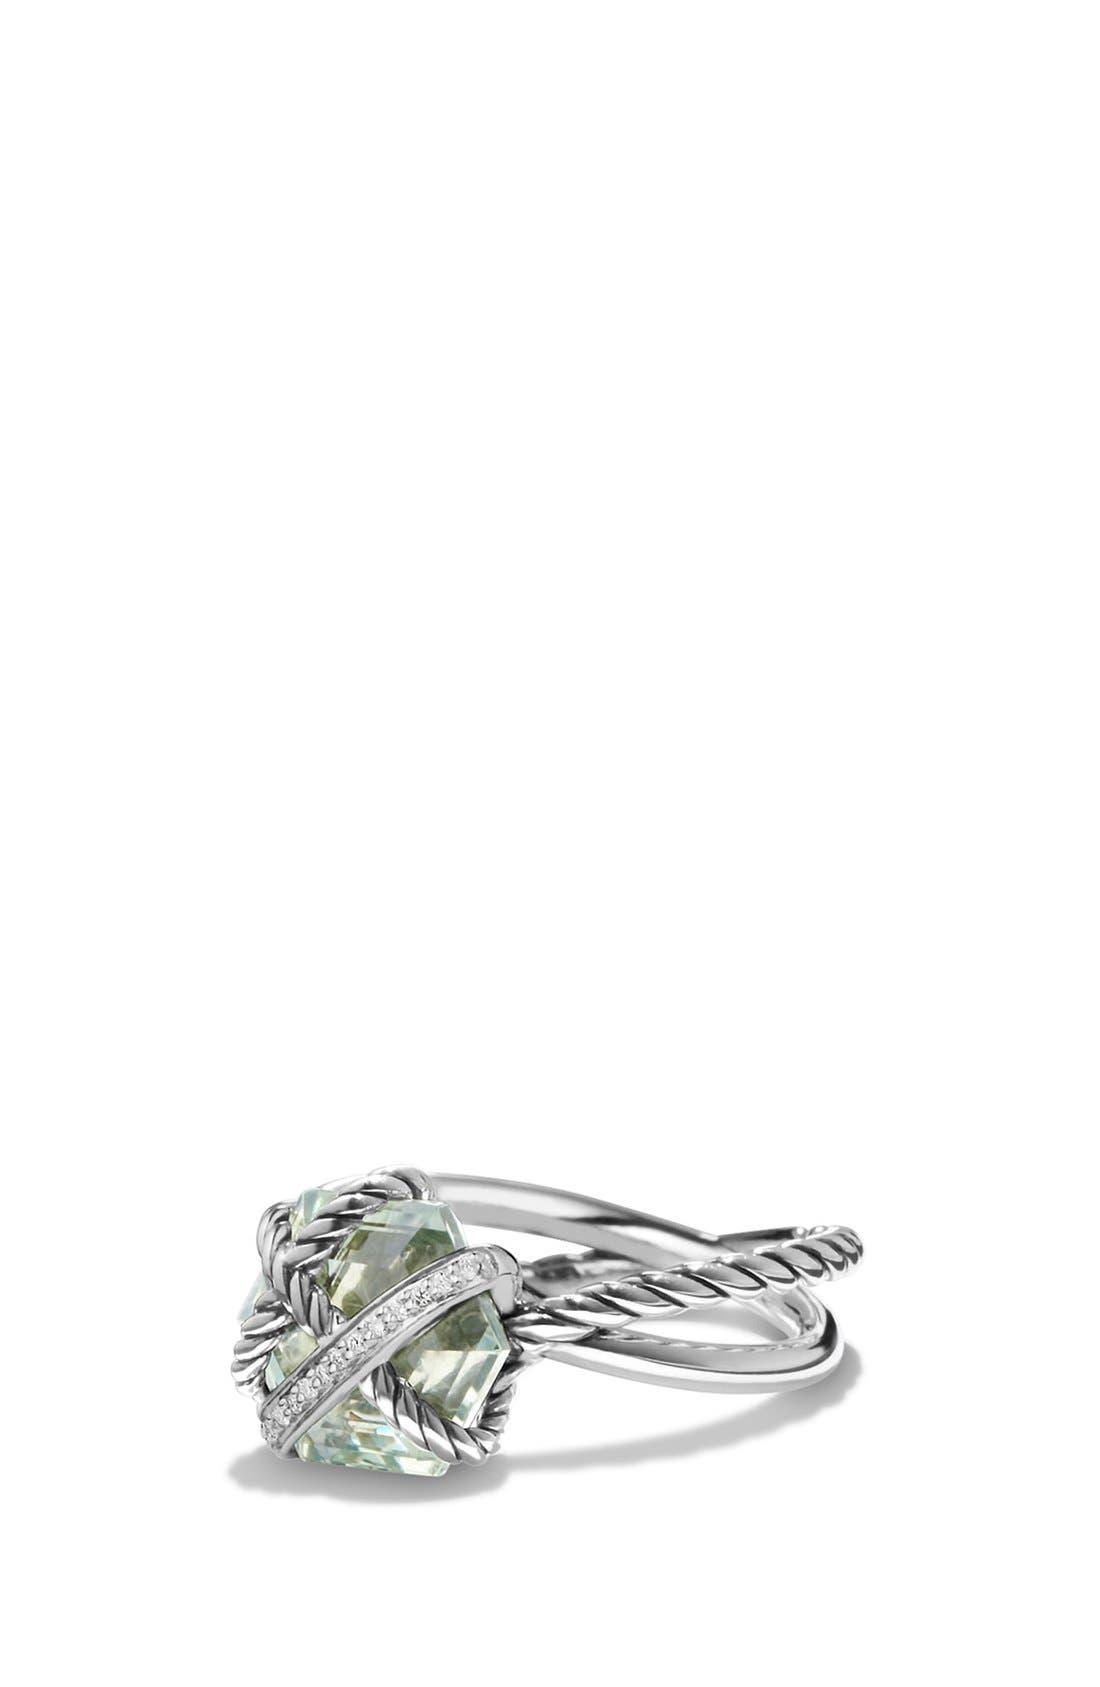 Alternate Image 1 Selected - David YurmanCable Wrap Ring with Semiprecious Stone andDiamonds